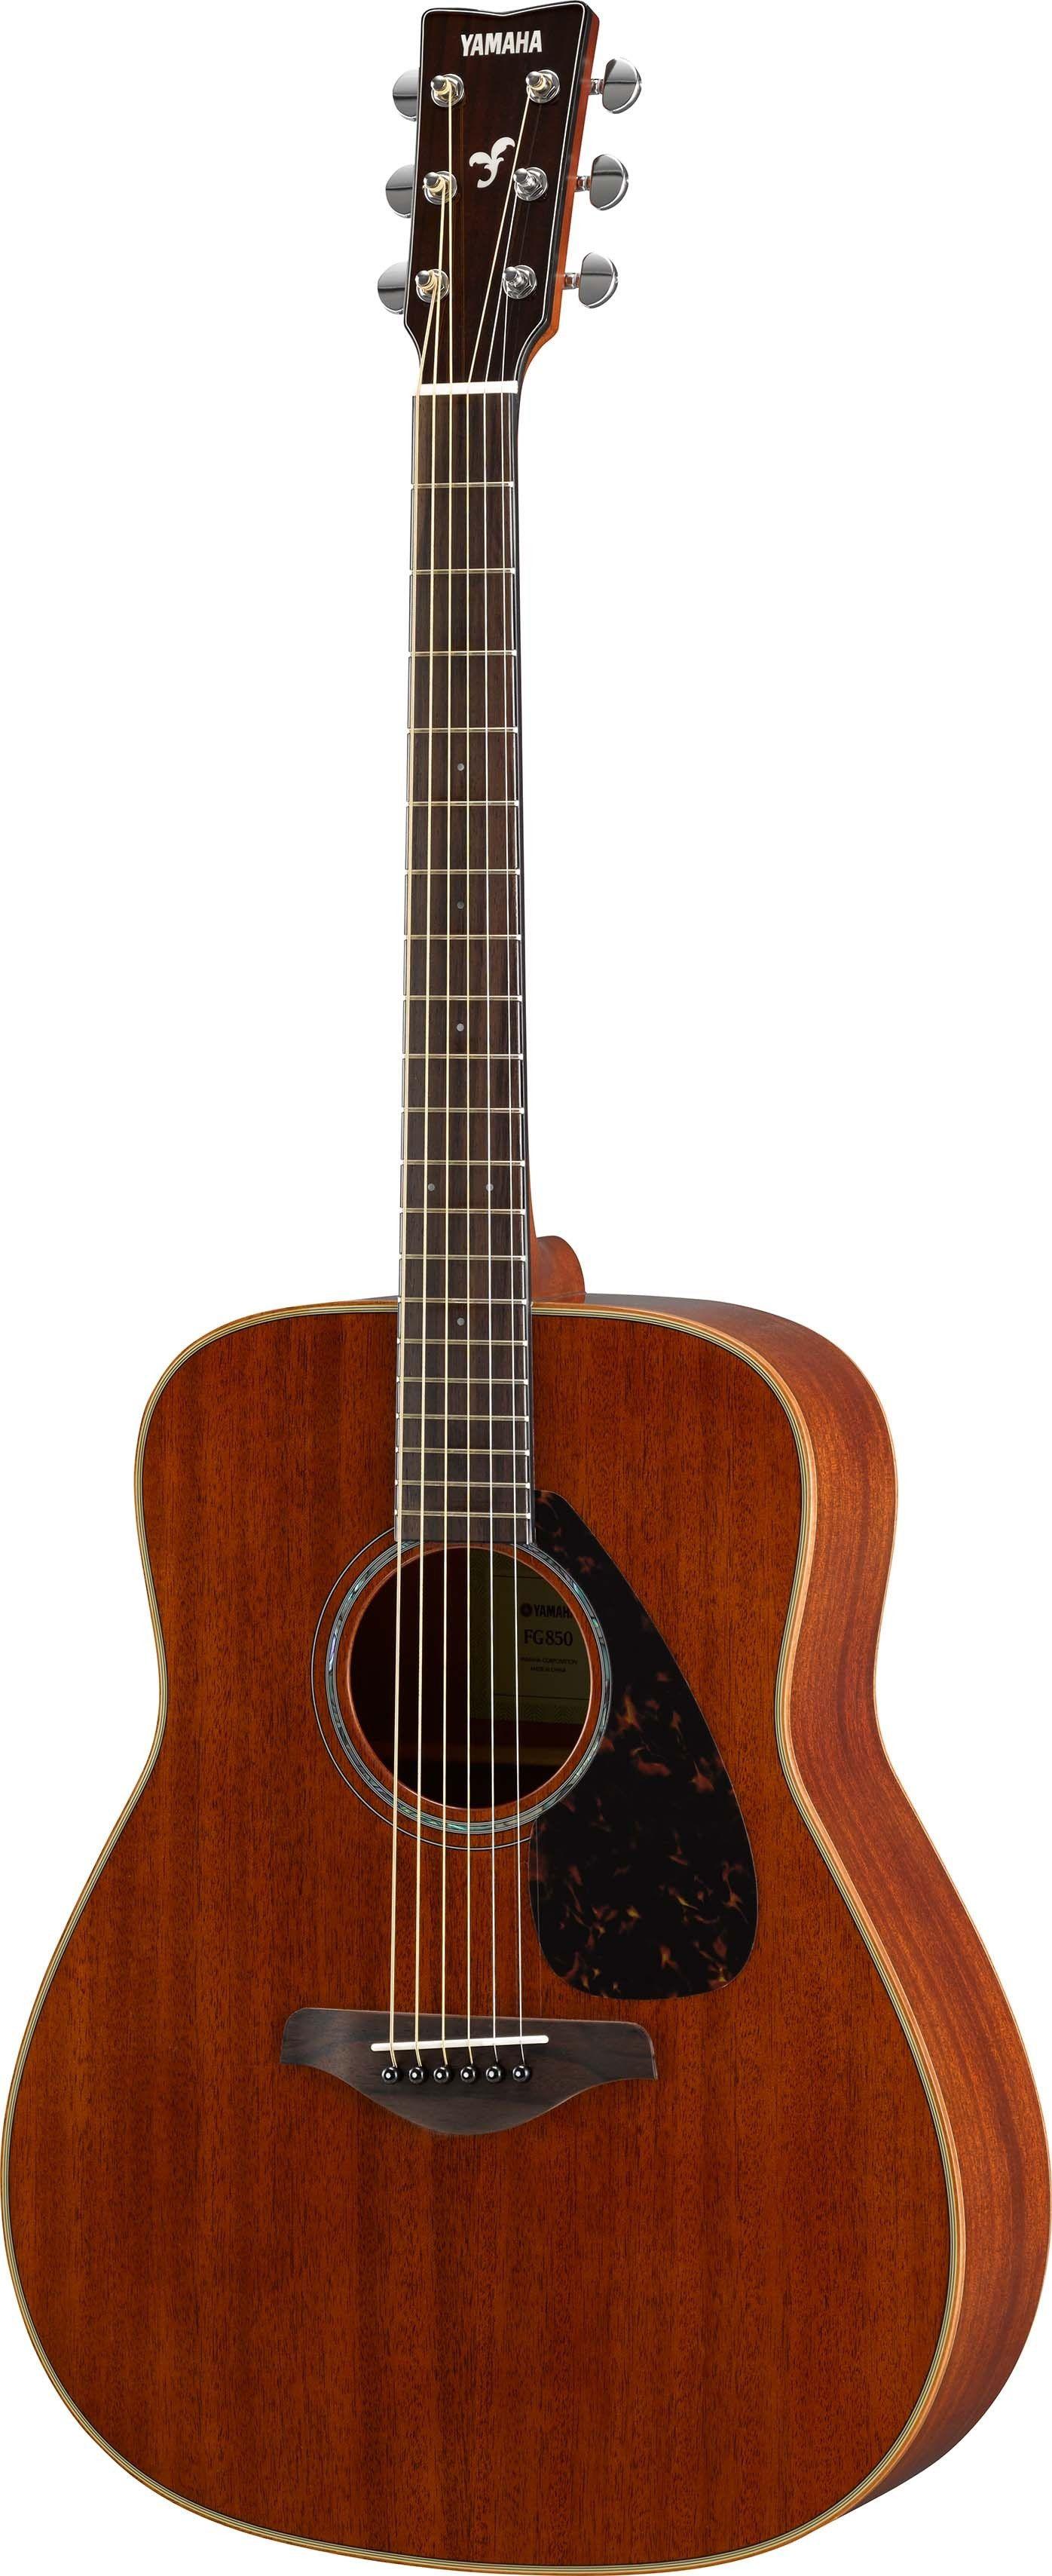 Yamaha Fg850 Natural Folk Acoustic Guitar Mahogany Yamaha Guitar Best Acoustic Guitar Yamaha Guitars Acoustic